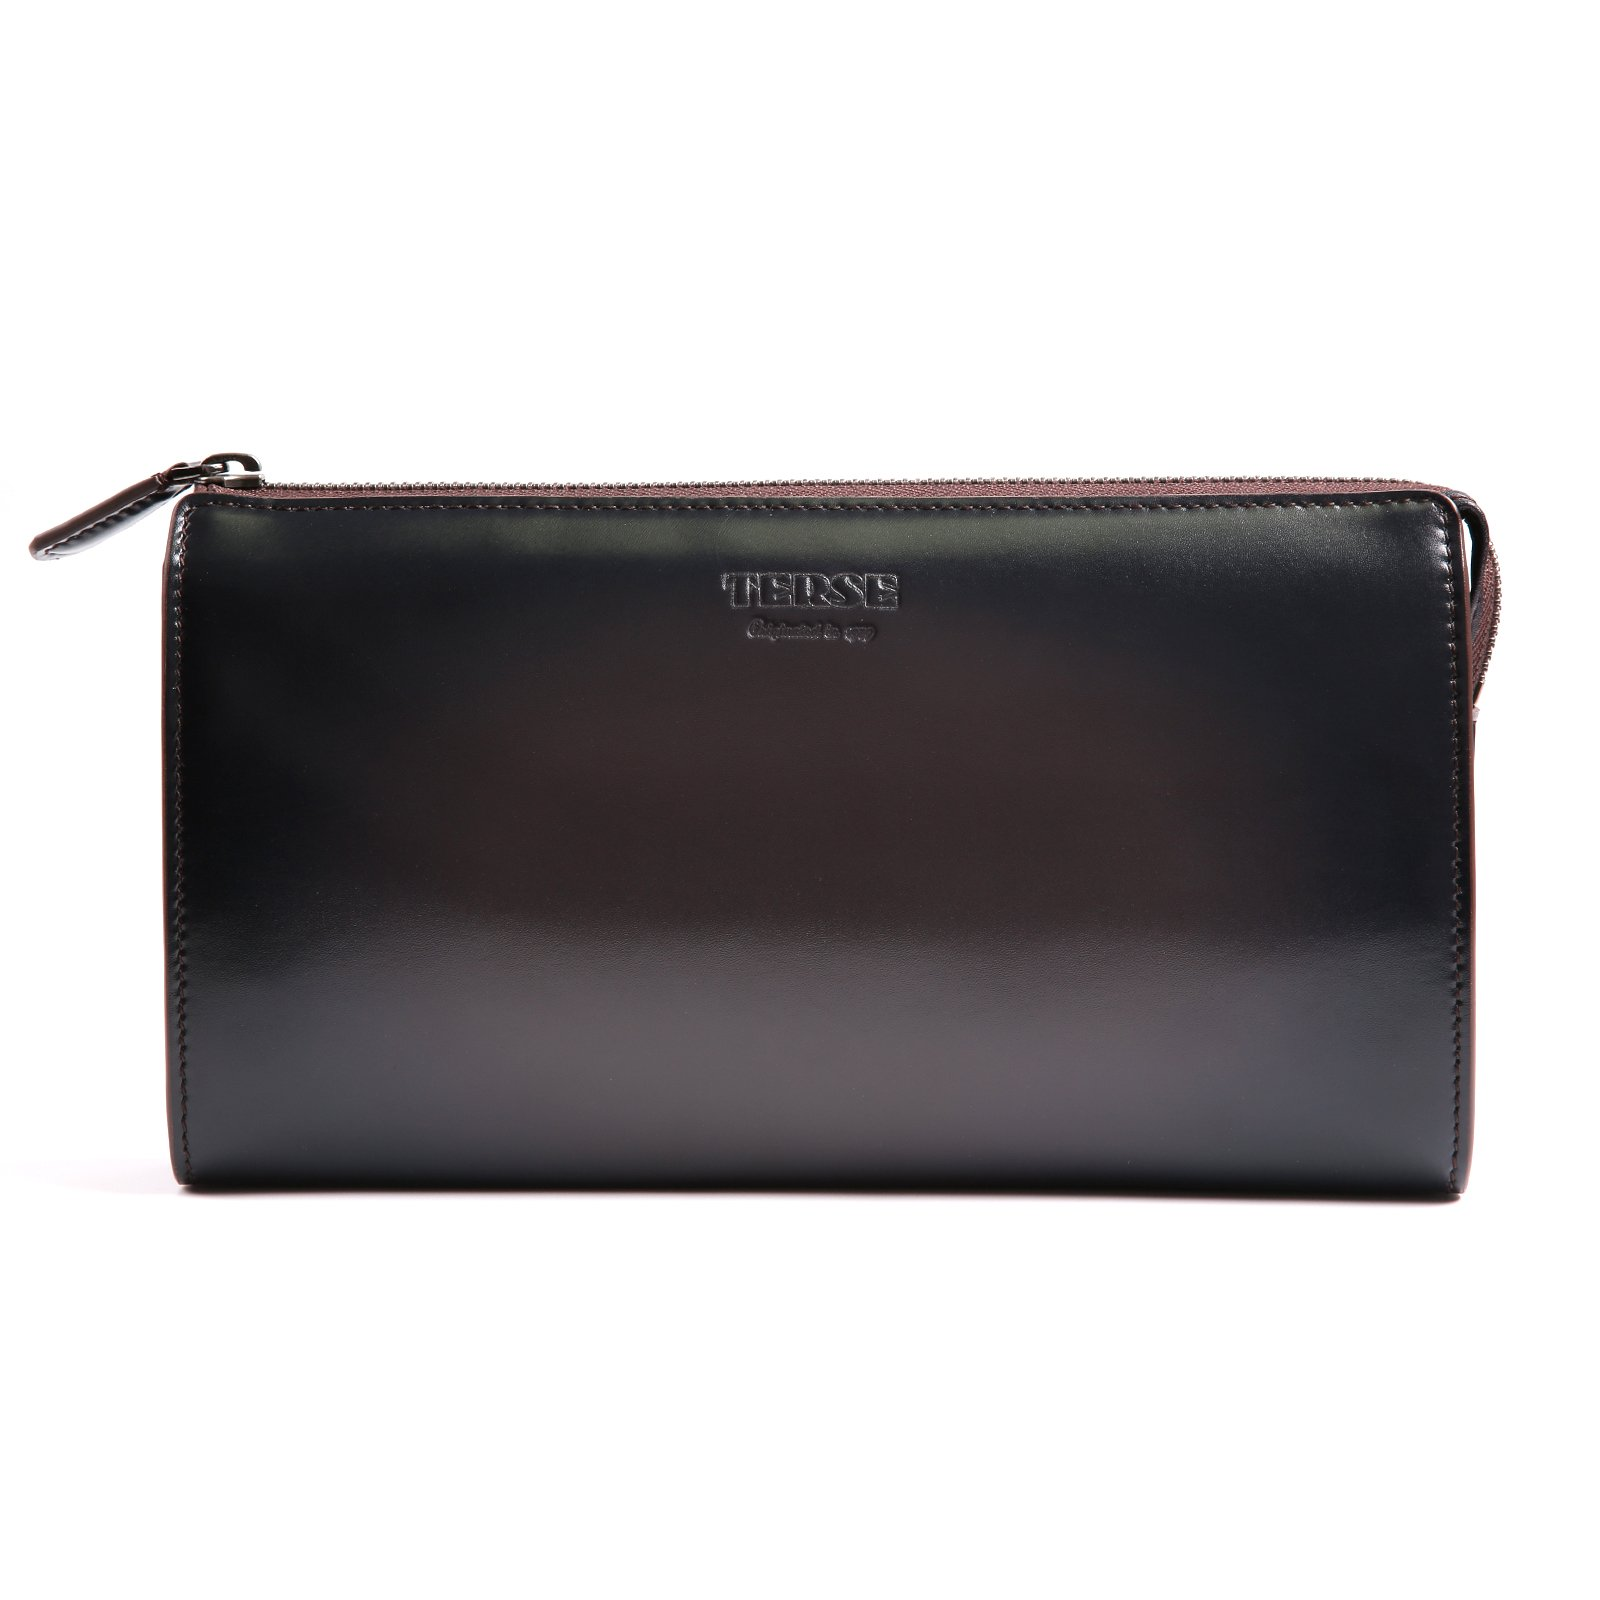 TERSE Men's Genuine Leather Clutch Bag Handmade Zipper Wallets Card Cash Holder Business Handbag Manual Brush-off (Grey) TS668A